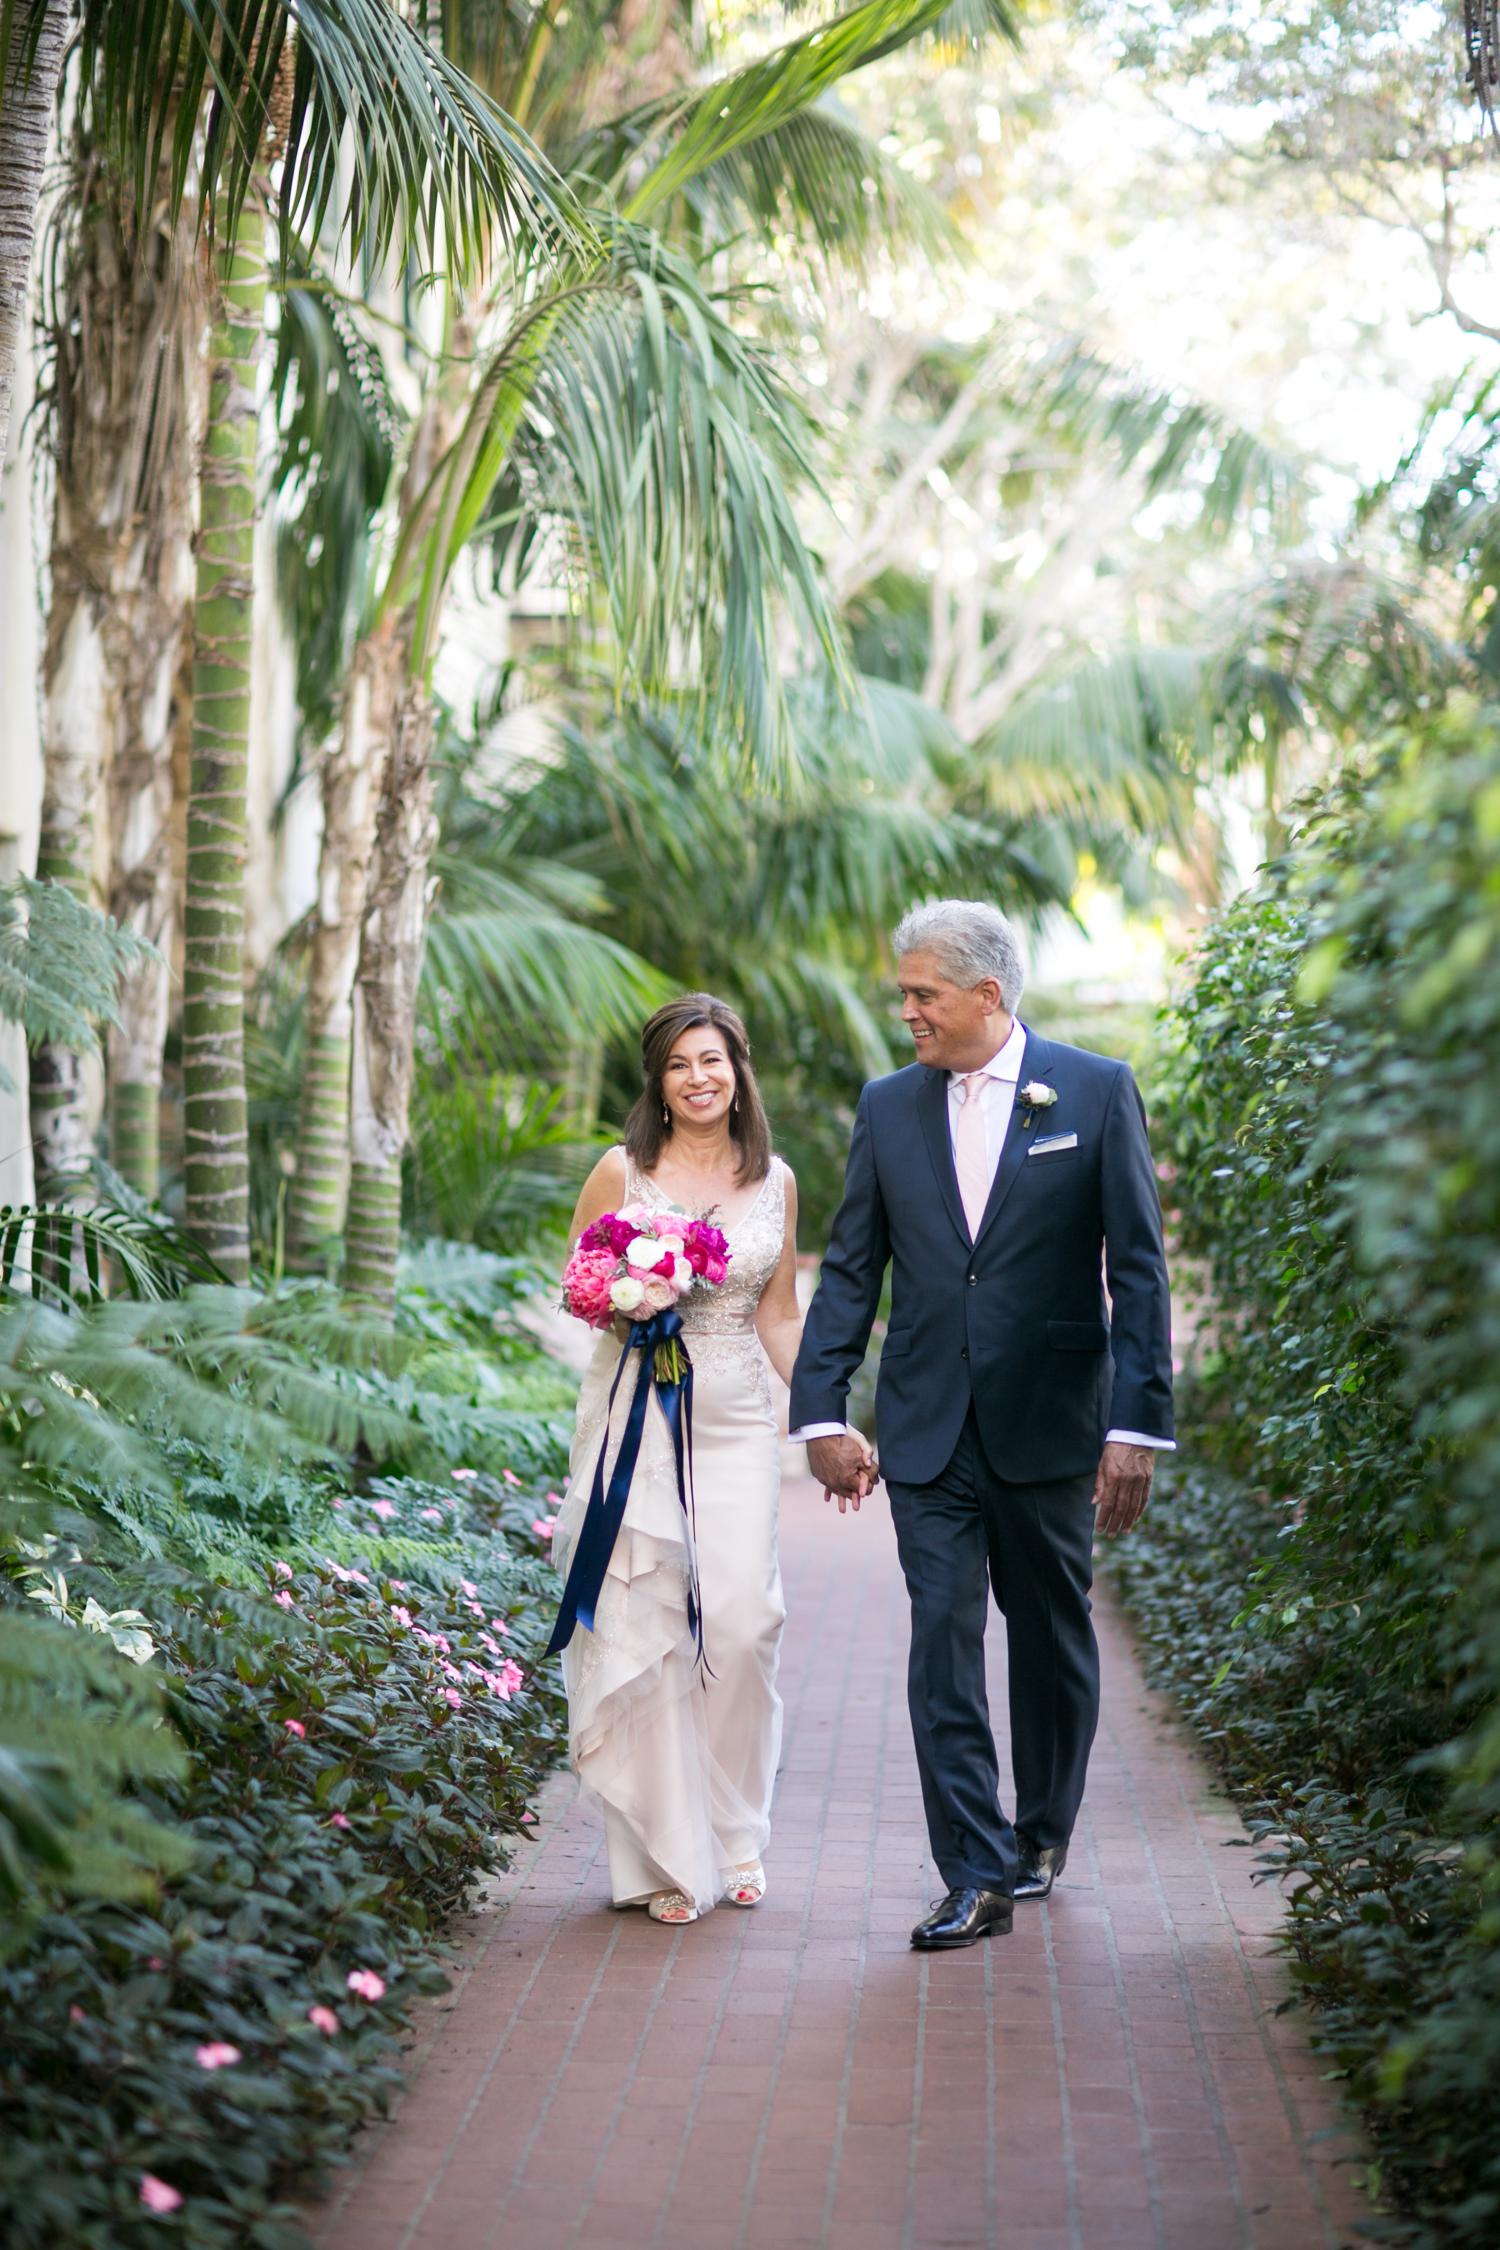 www.santabarbarawedding.com | Miki & Sonja Photography | Four Seasons Resort The Biltmore | Imagine Weddings & Special Events | Lisa Bassler | Bride and Groom Before Ceremony